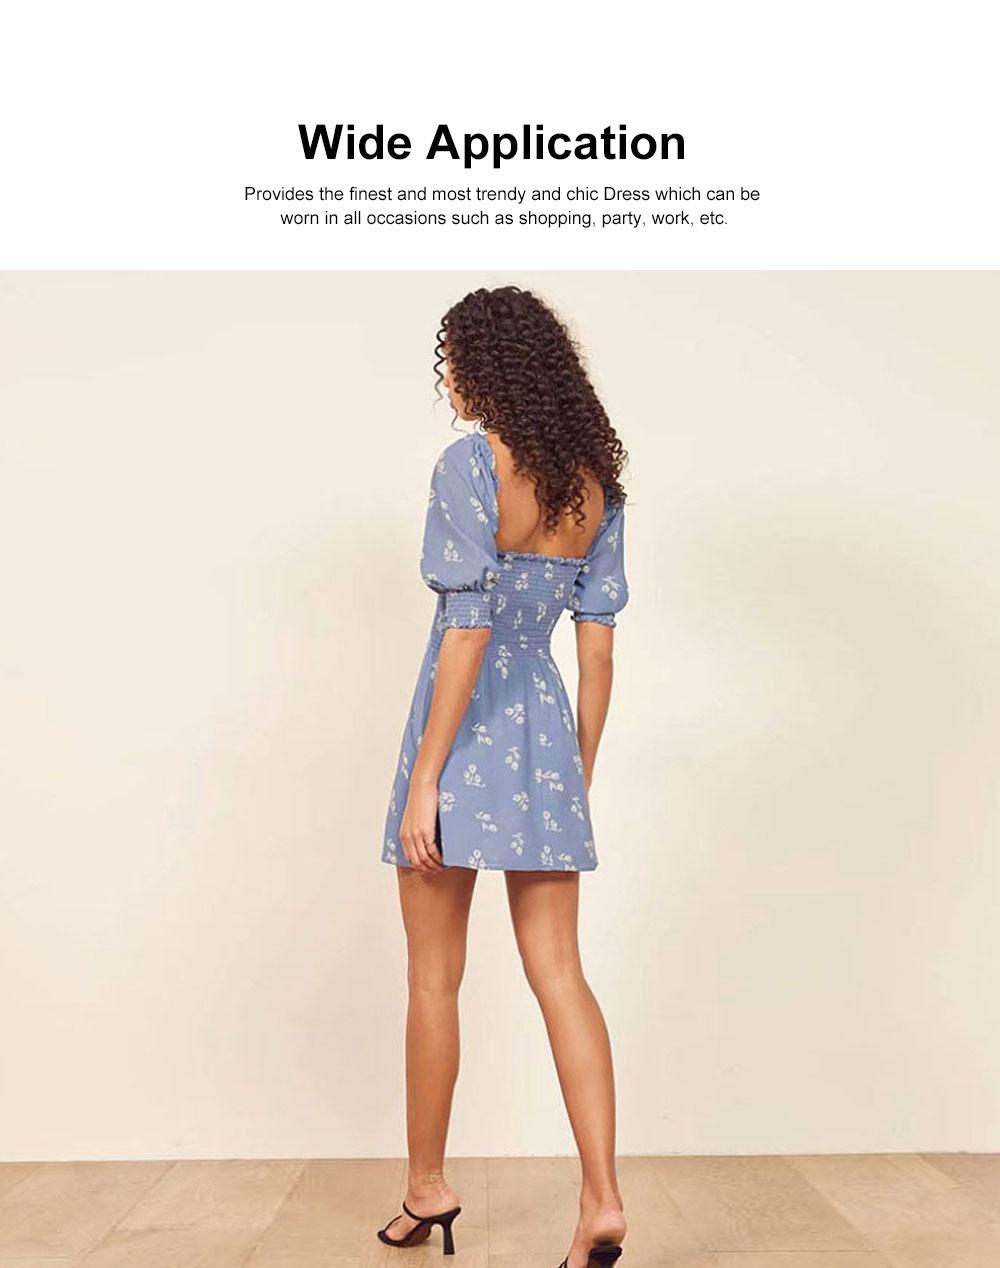 One Piece French Style Women Dress Pleated &High Waist Knee Length Summer Dress Ruffle Sleeve Dress for Women's Gifts 3